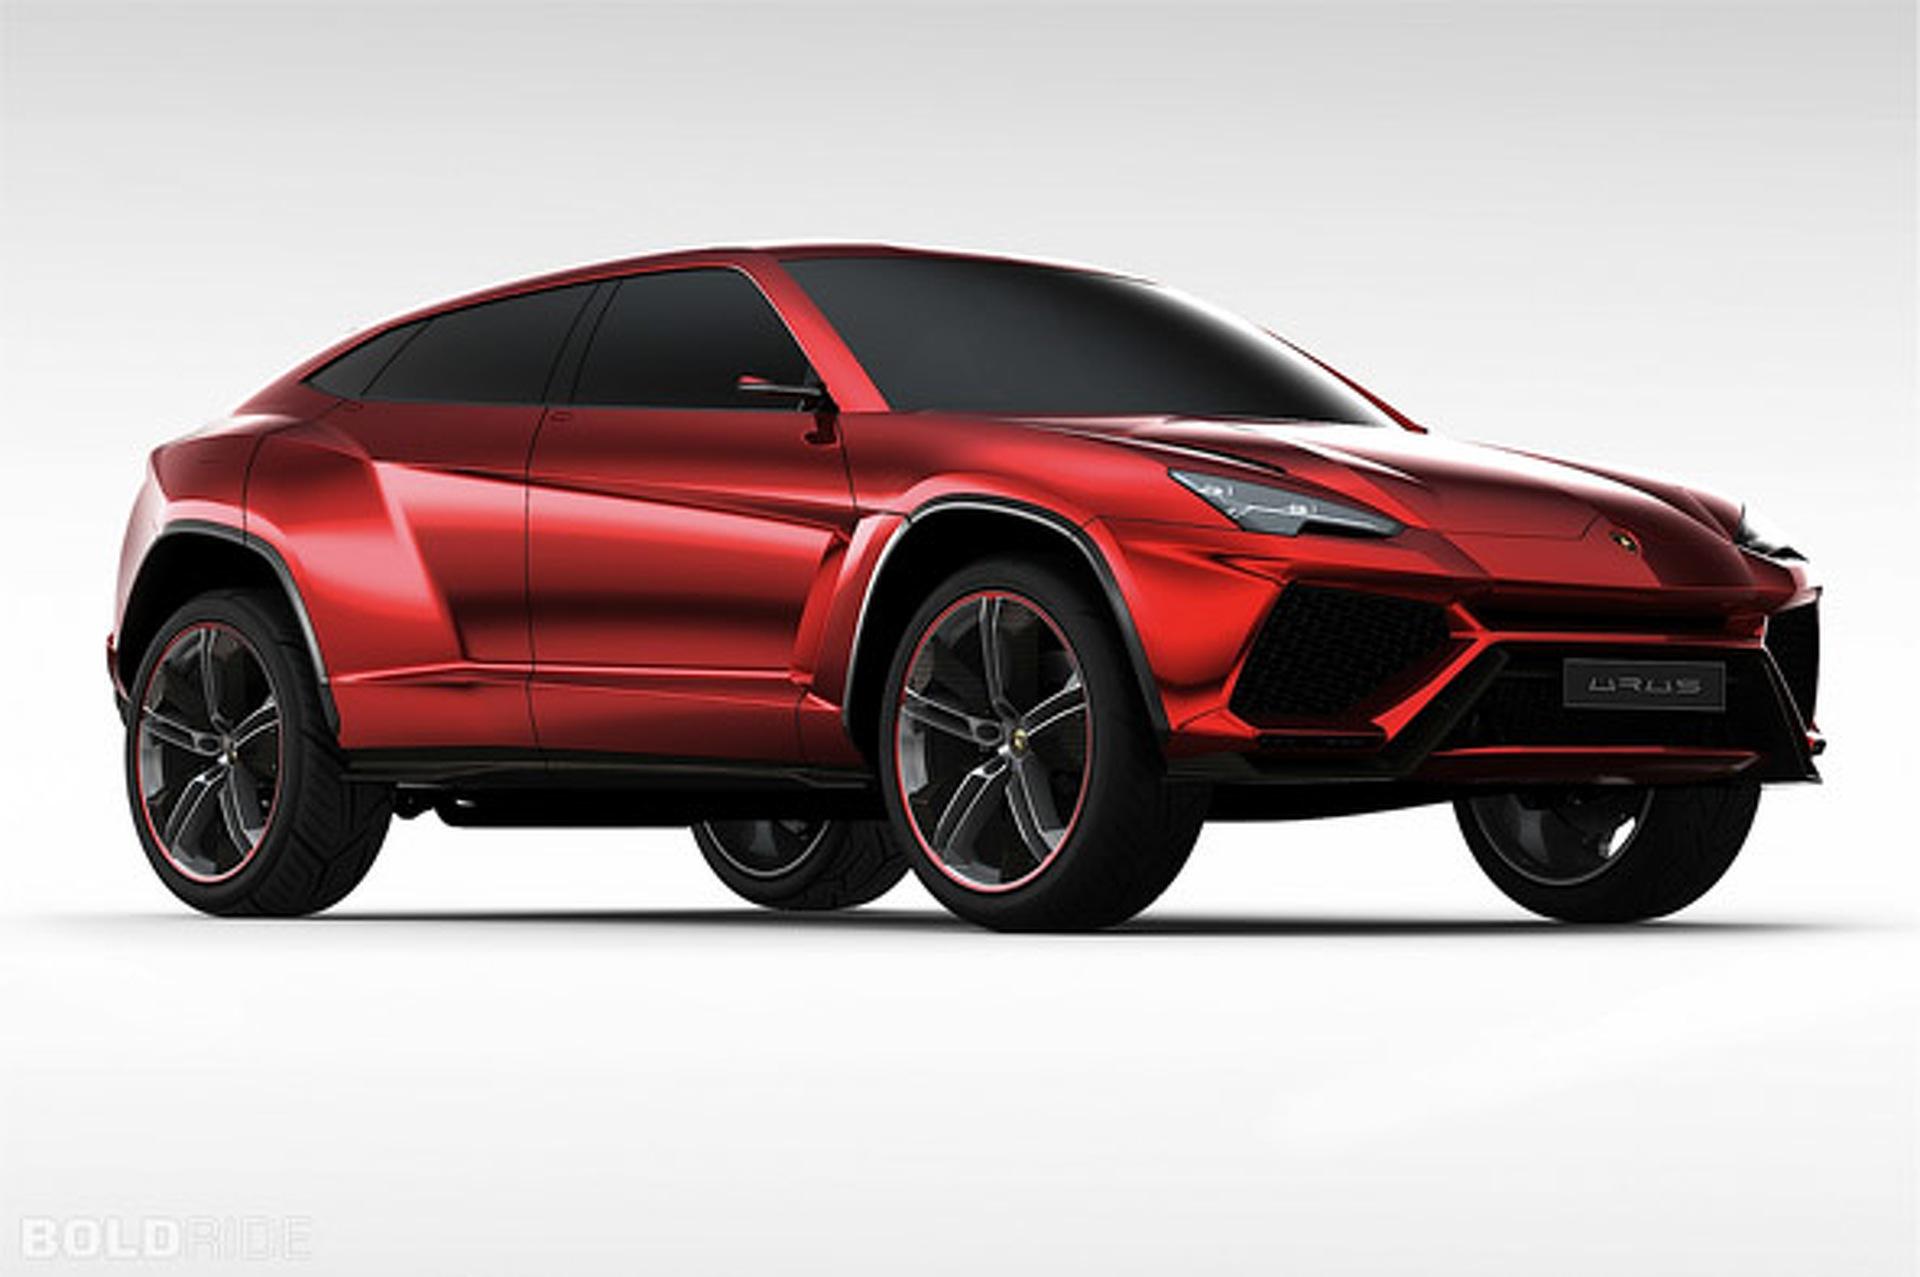 Most Popular: 2012 Lamborghini Urus SUV Concept